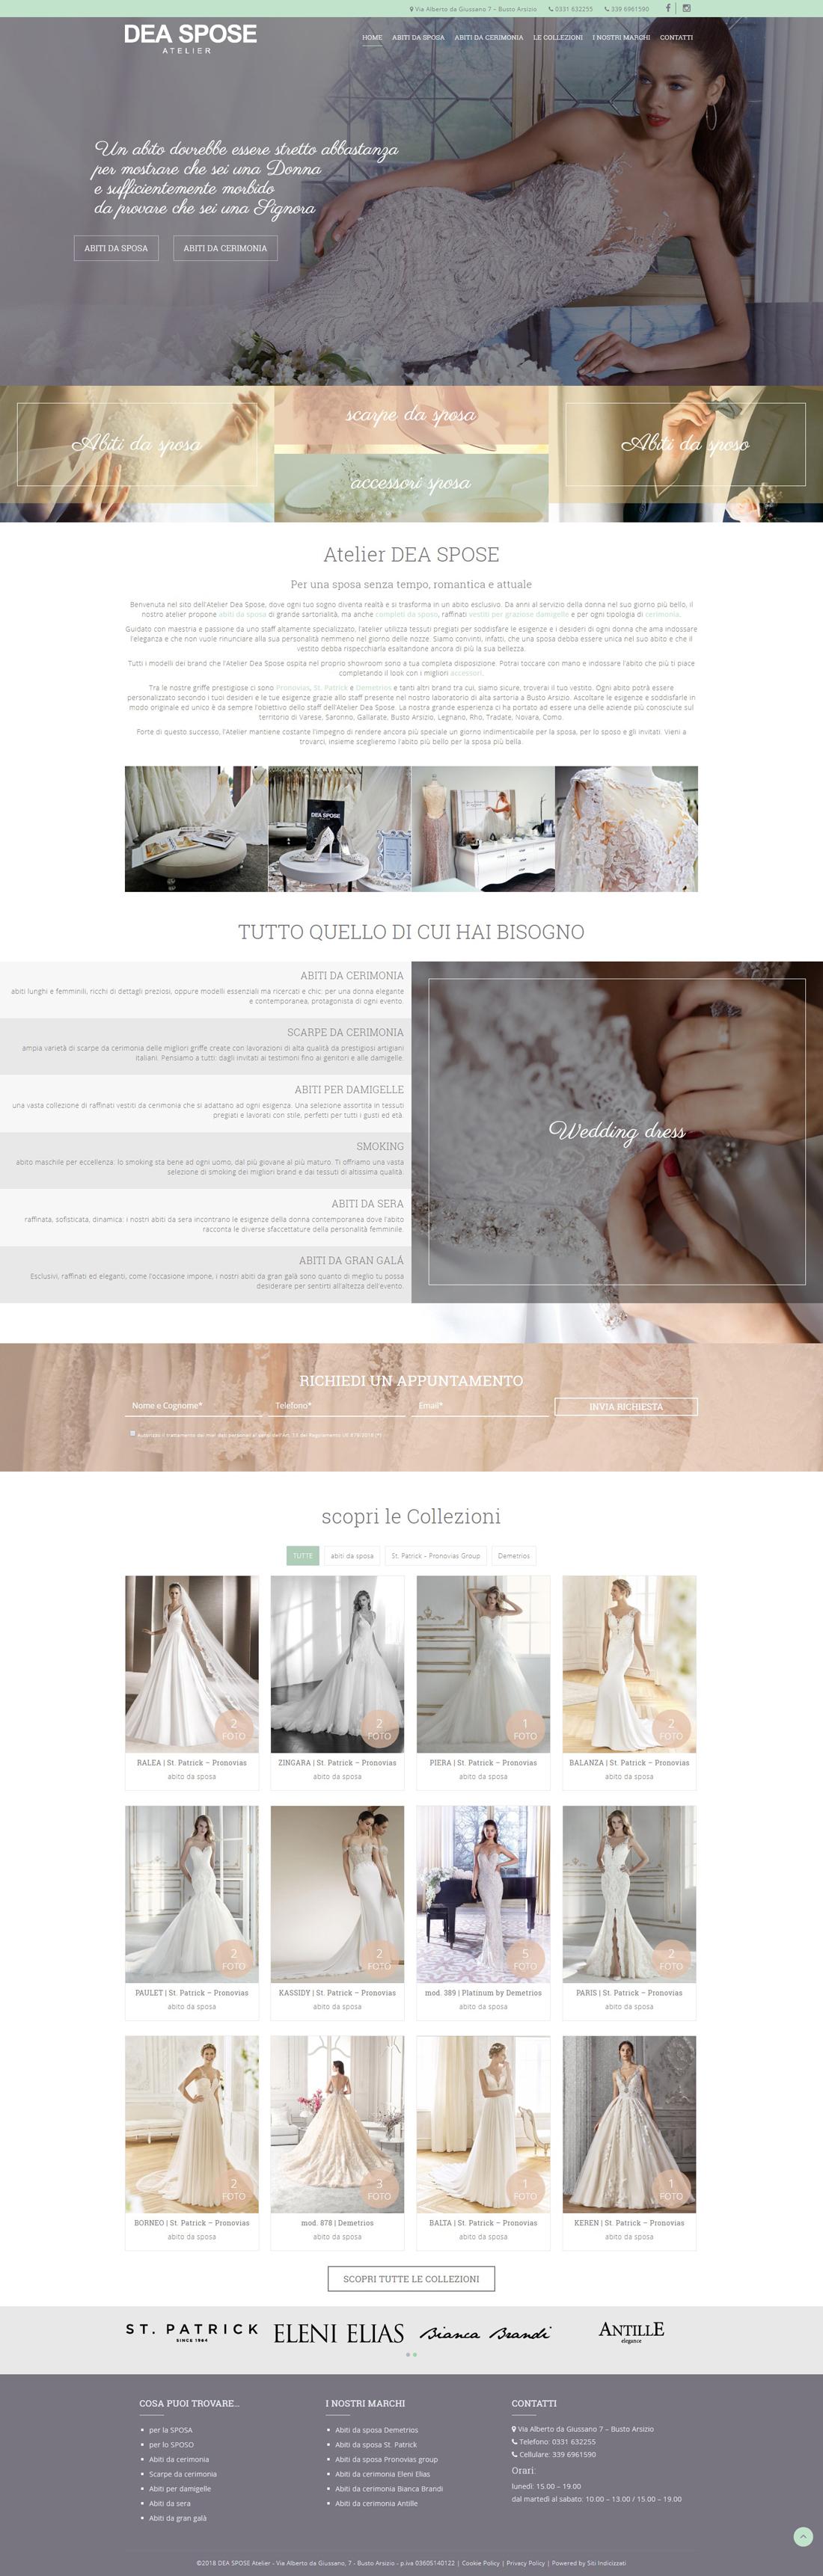 c04d08ec6d Dea Spose - Atelier Abiti da sposa